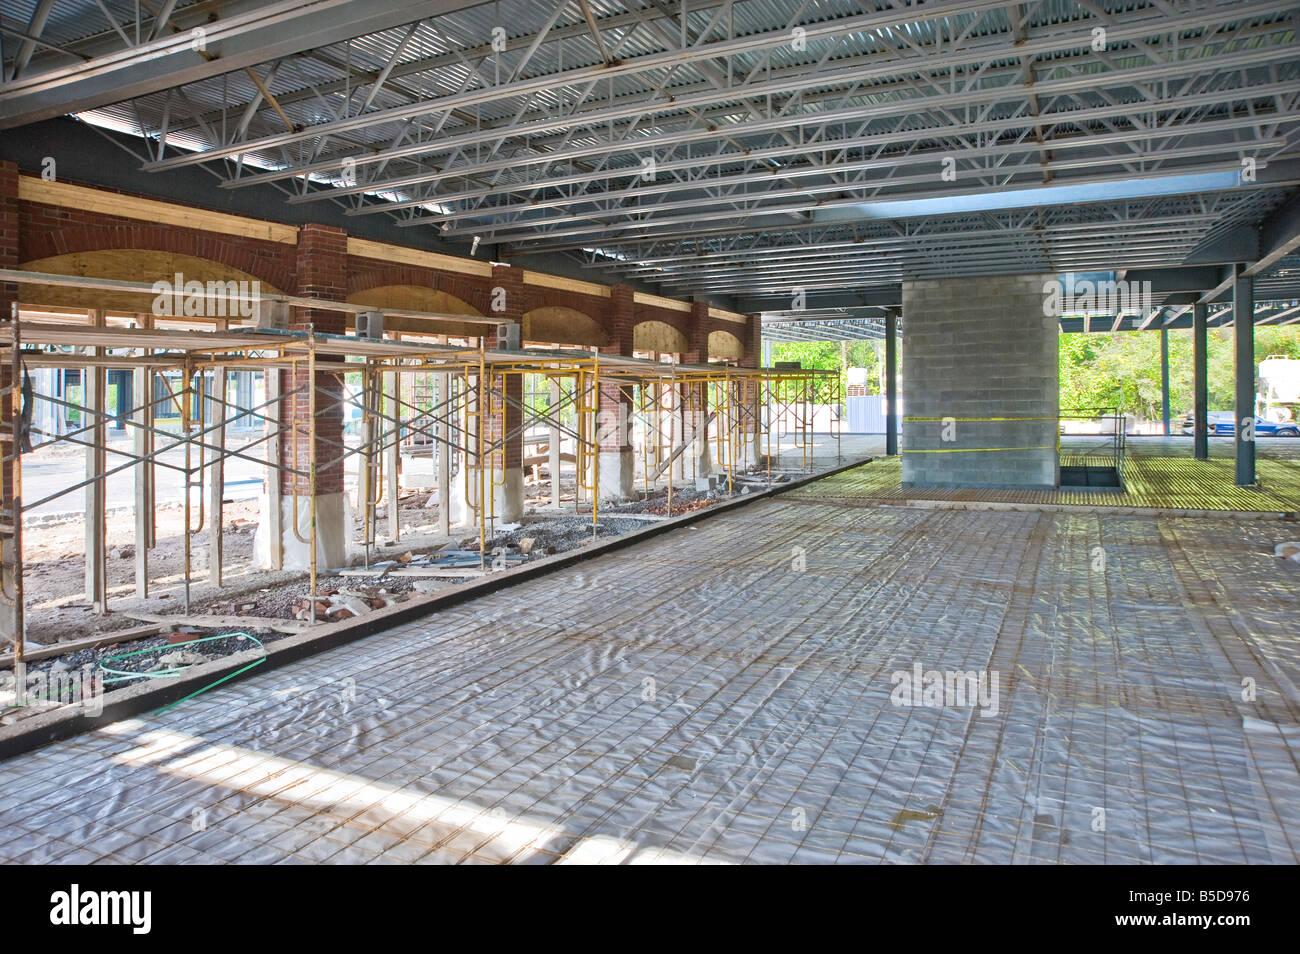 Inside Construction Site Commercial Building Interior Usa Stock Photo 20576282 Alamy